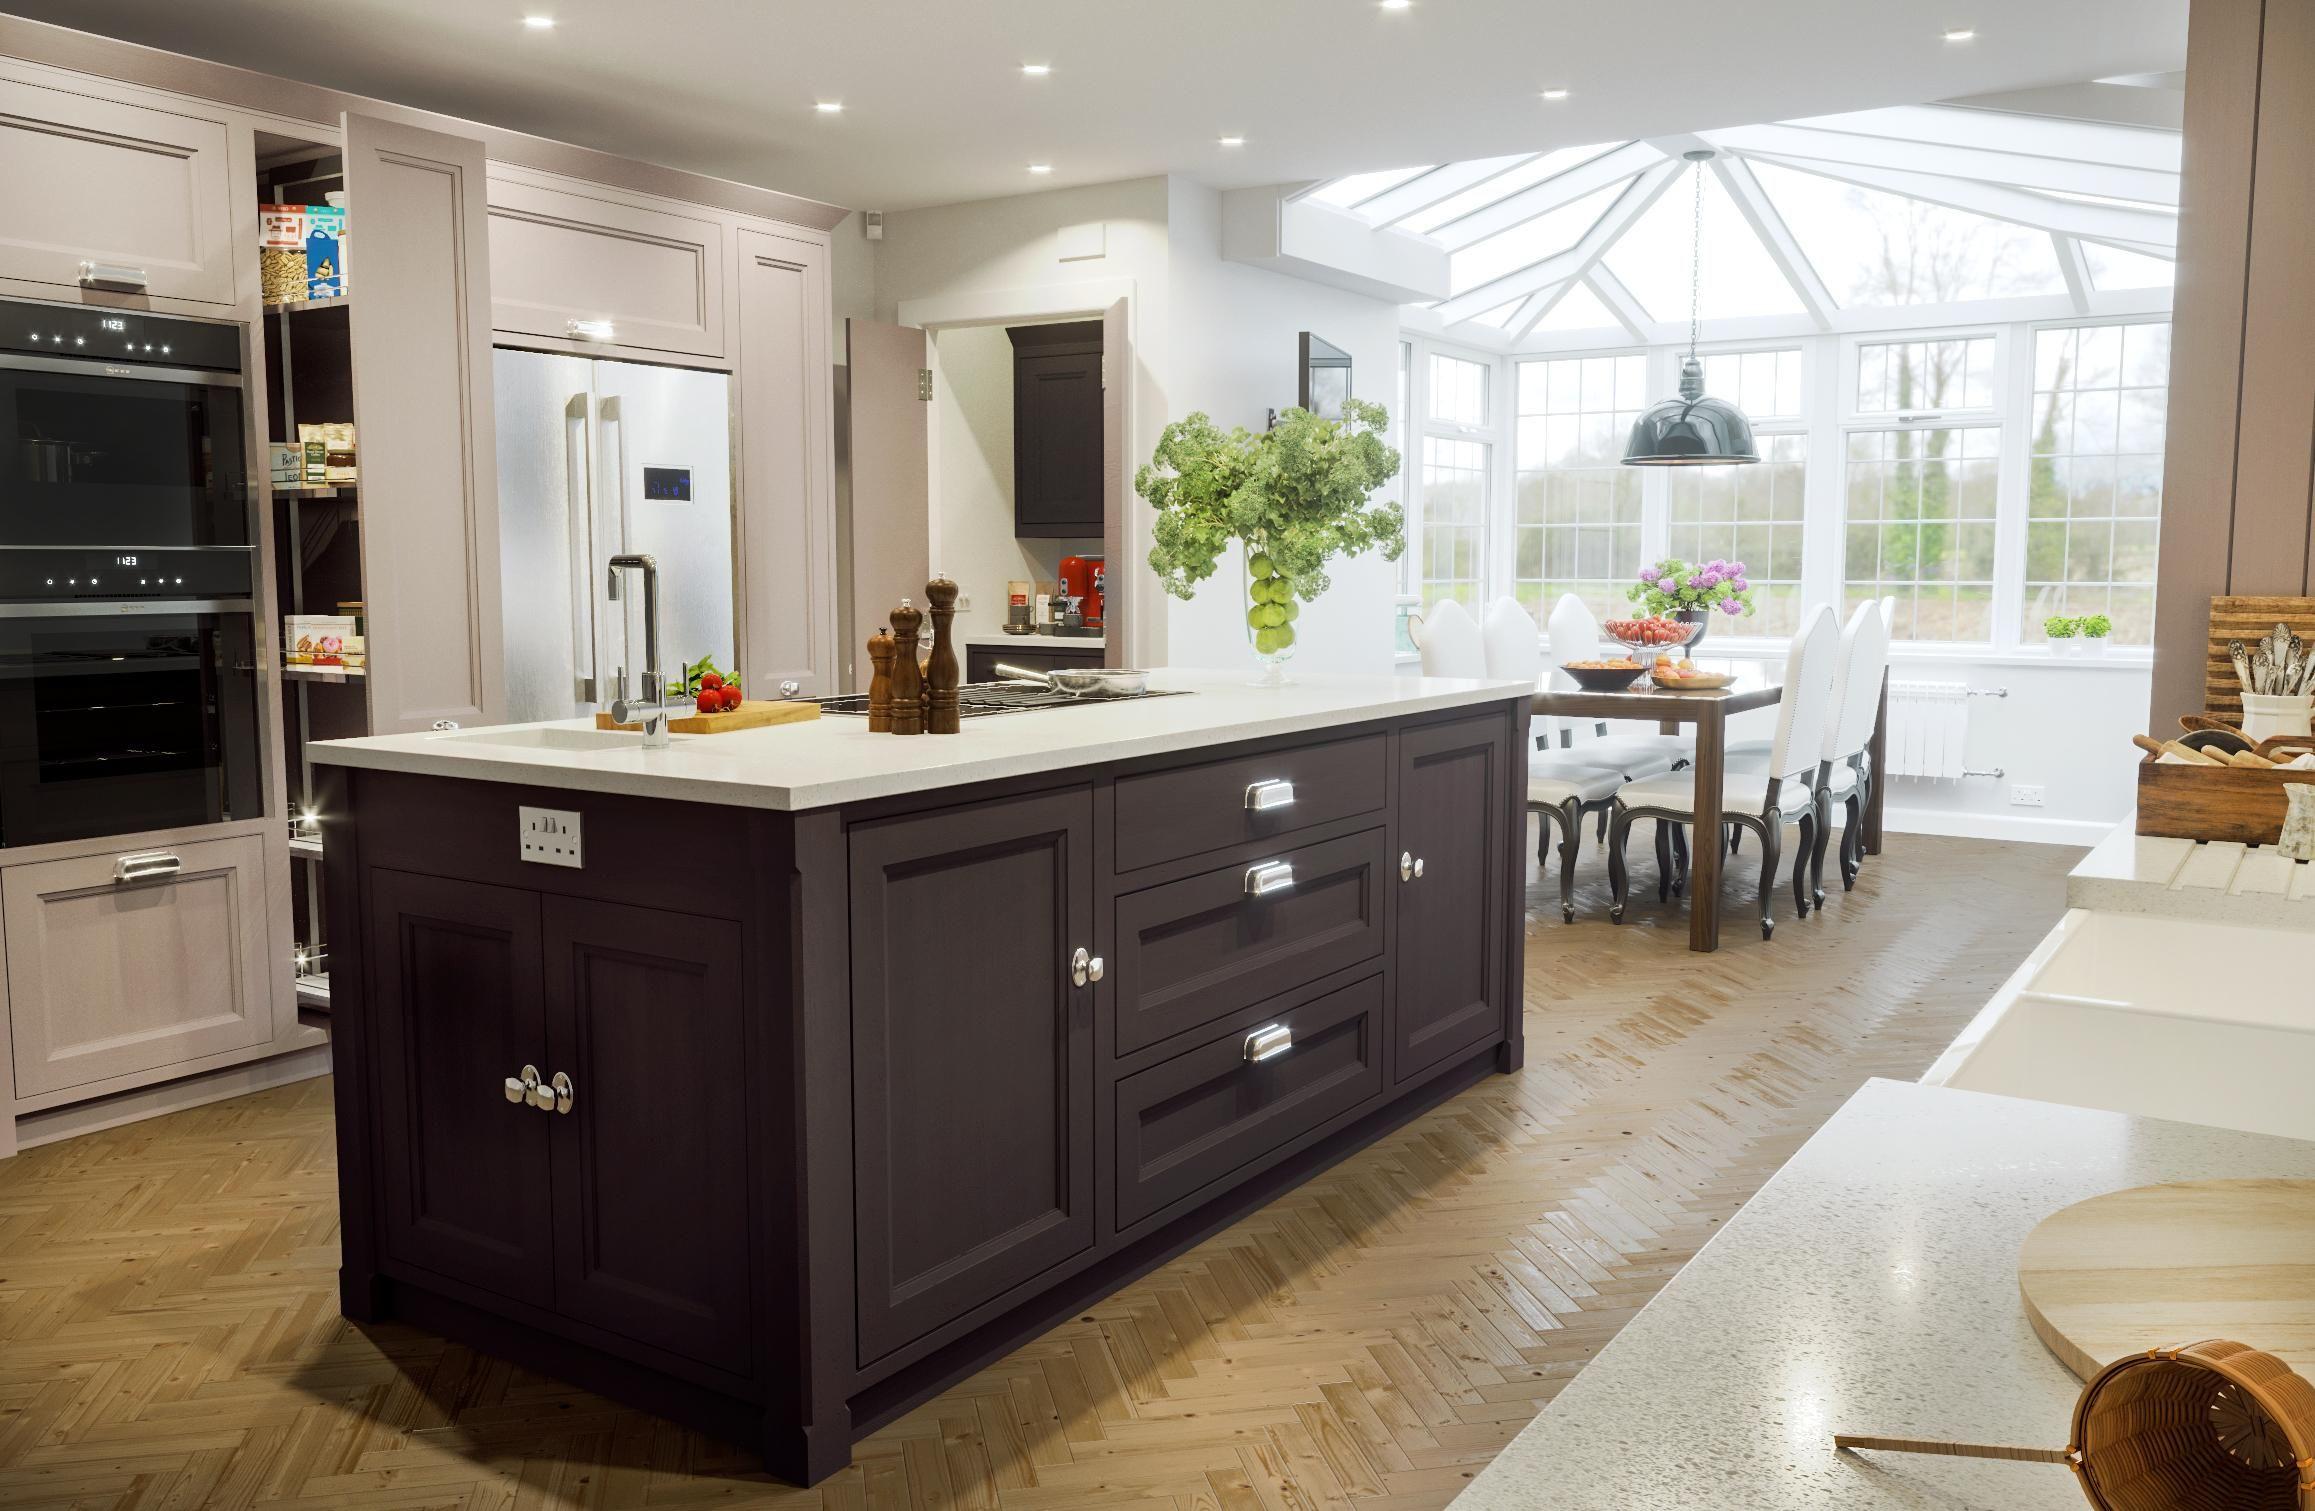 New To Reddit This Is One Of My Recent Renders 2315 X 1511 Kitchen Design Kitchen World Kitchen Cabinets